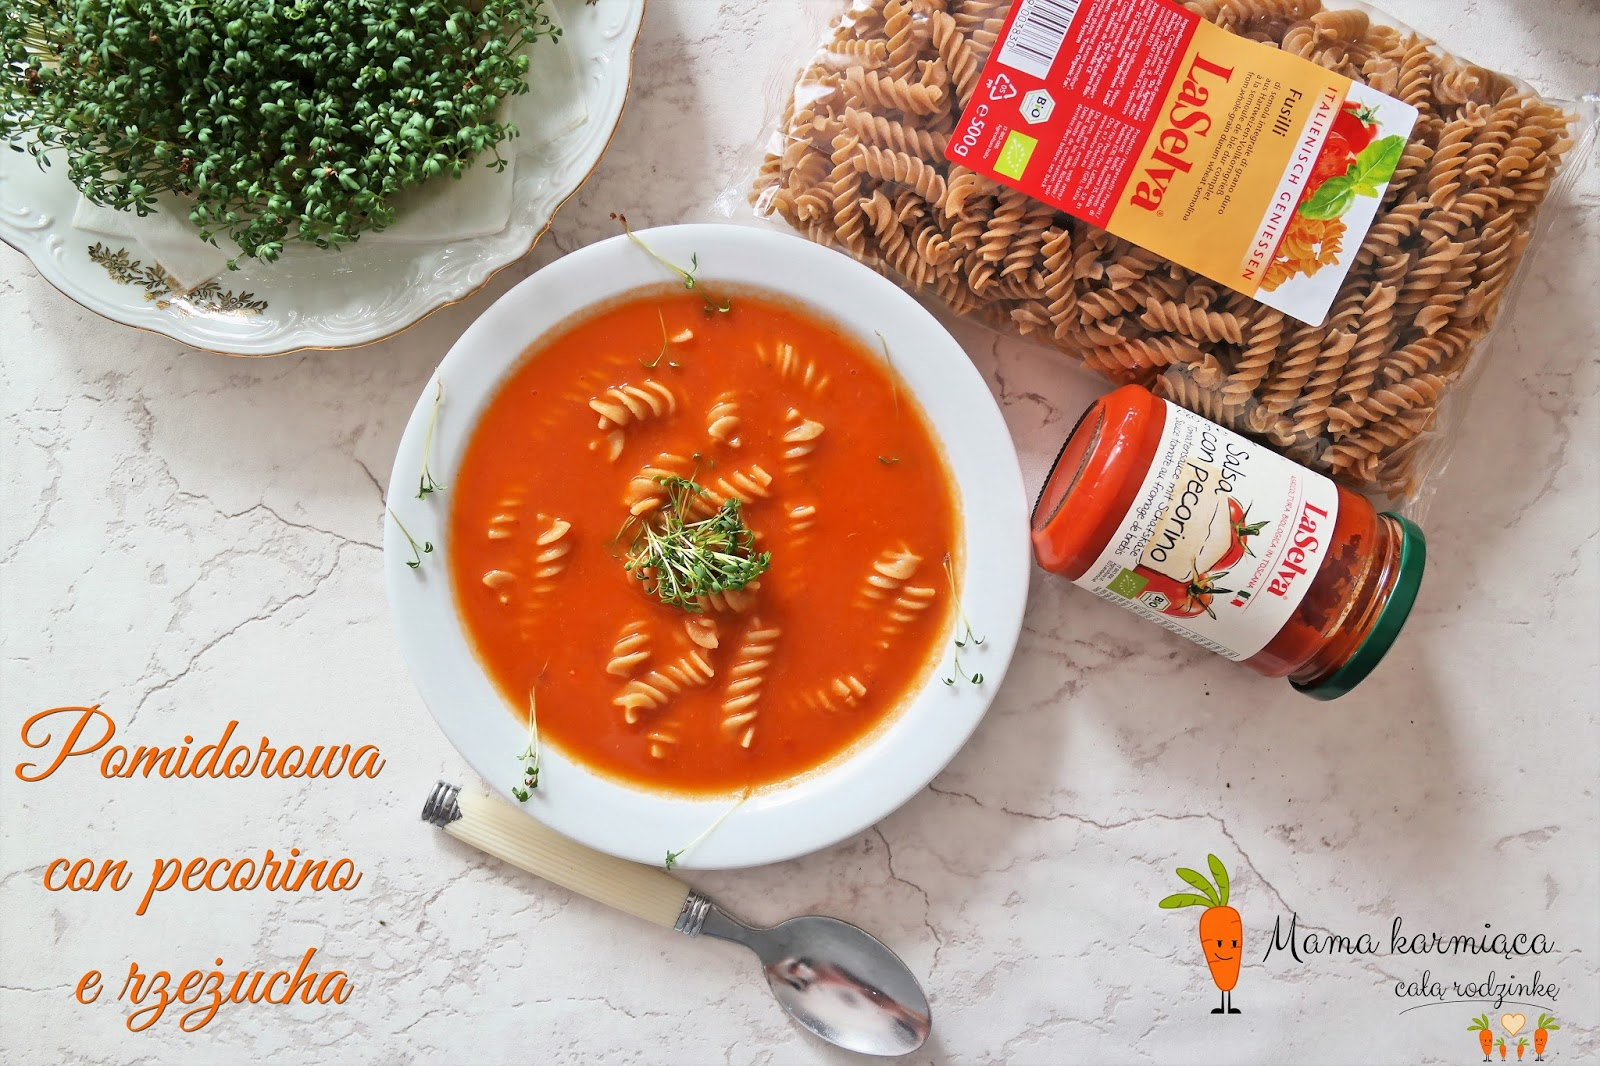 Pomidorowa con pecorino e rzeżucha